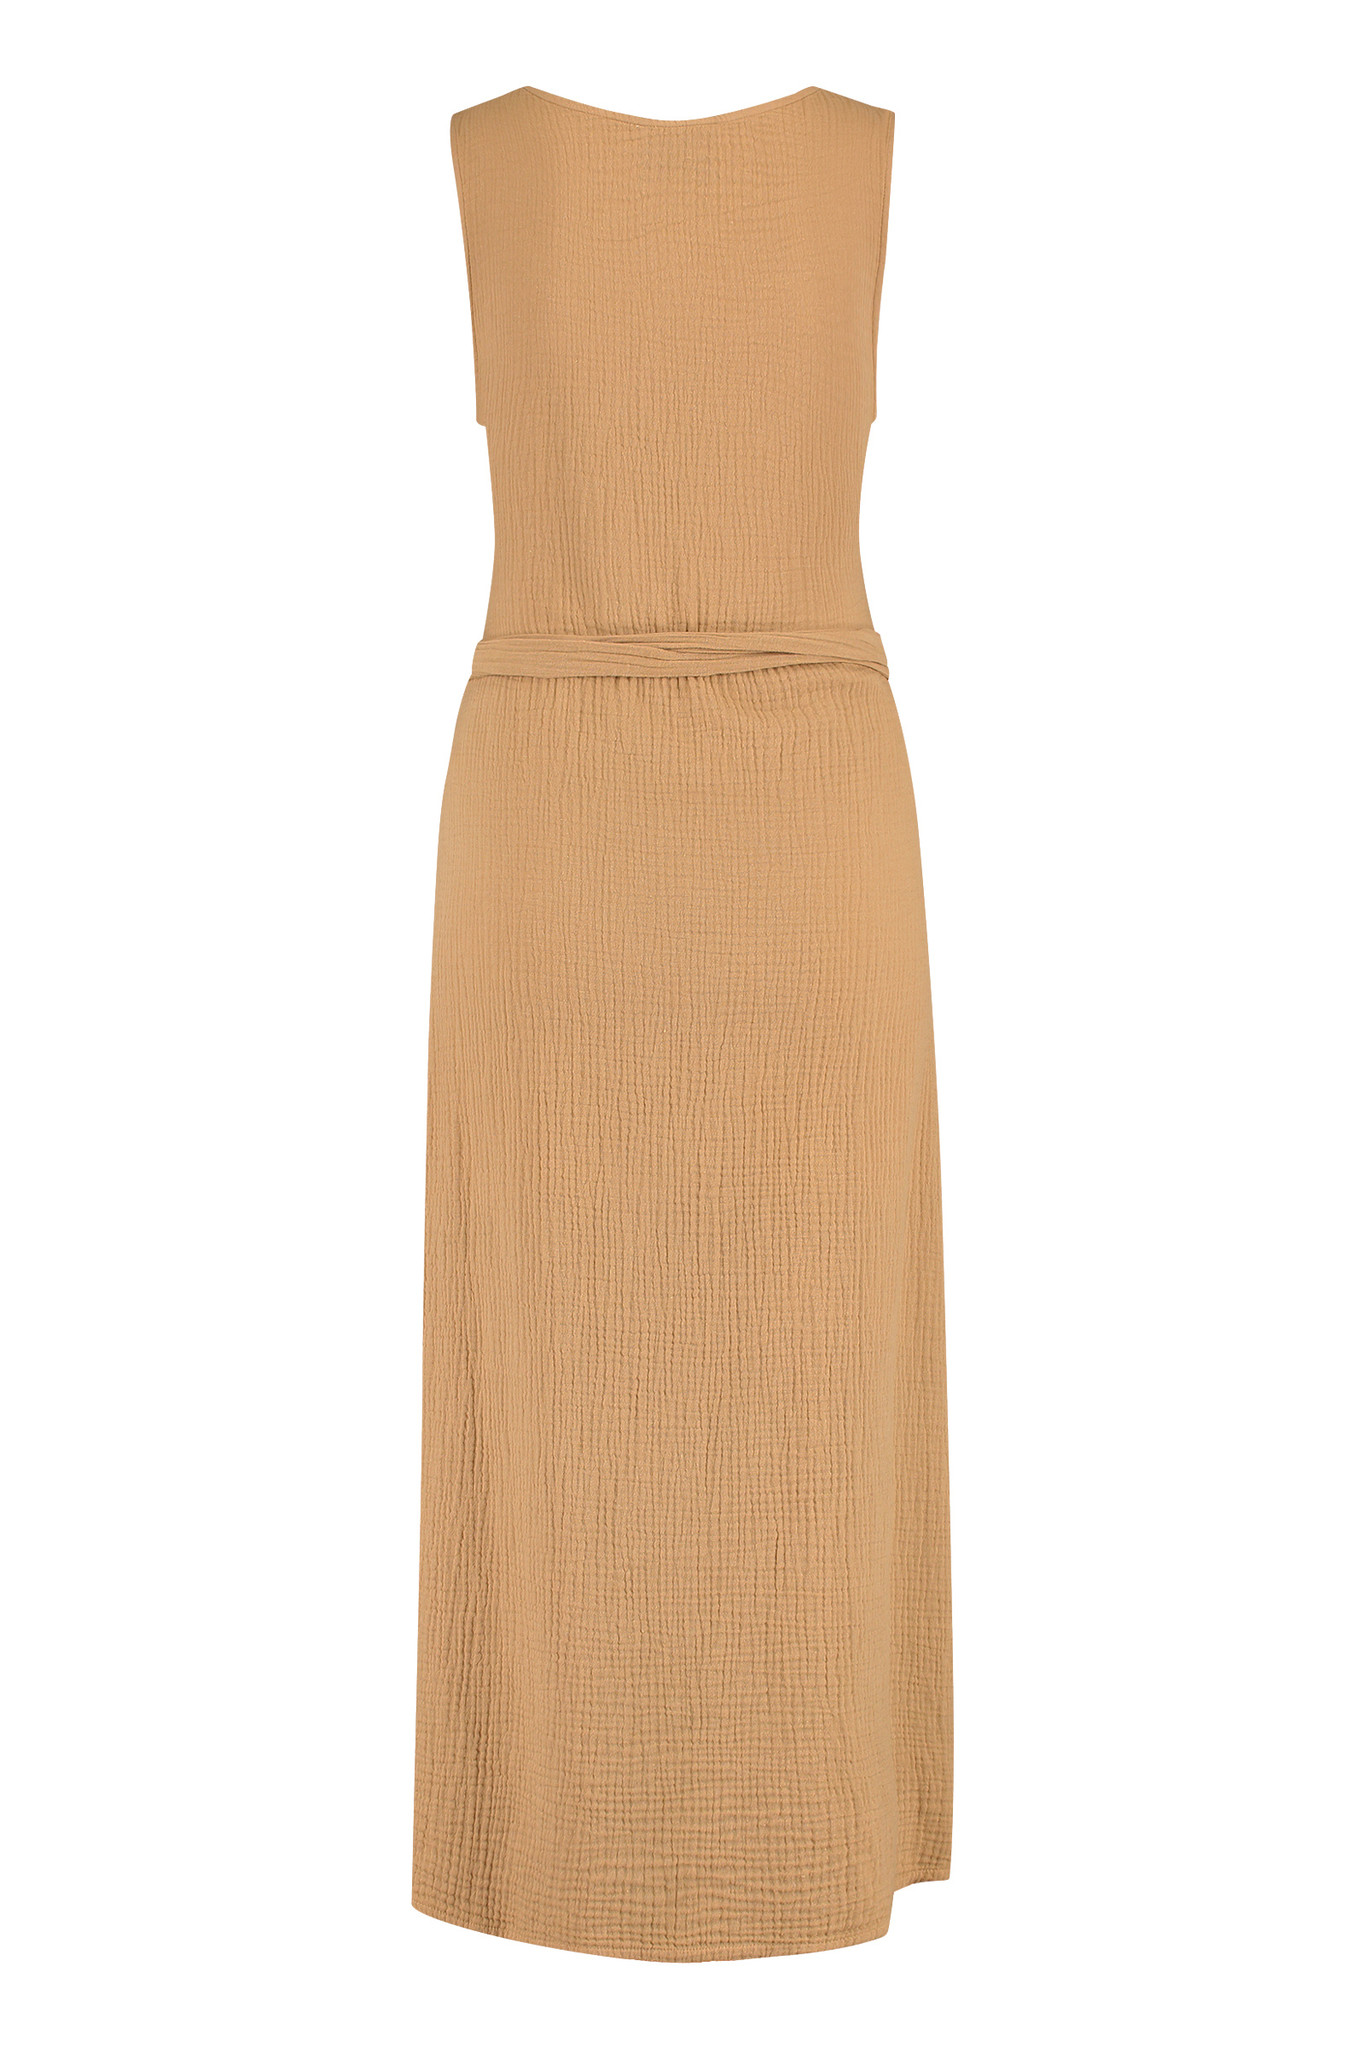 Penn & Ink Dress S21T598LTD-2